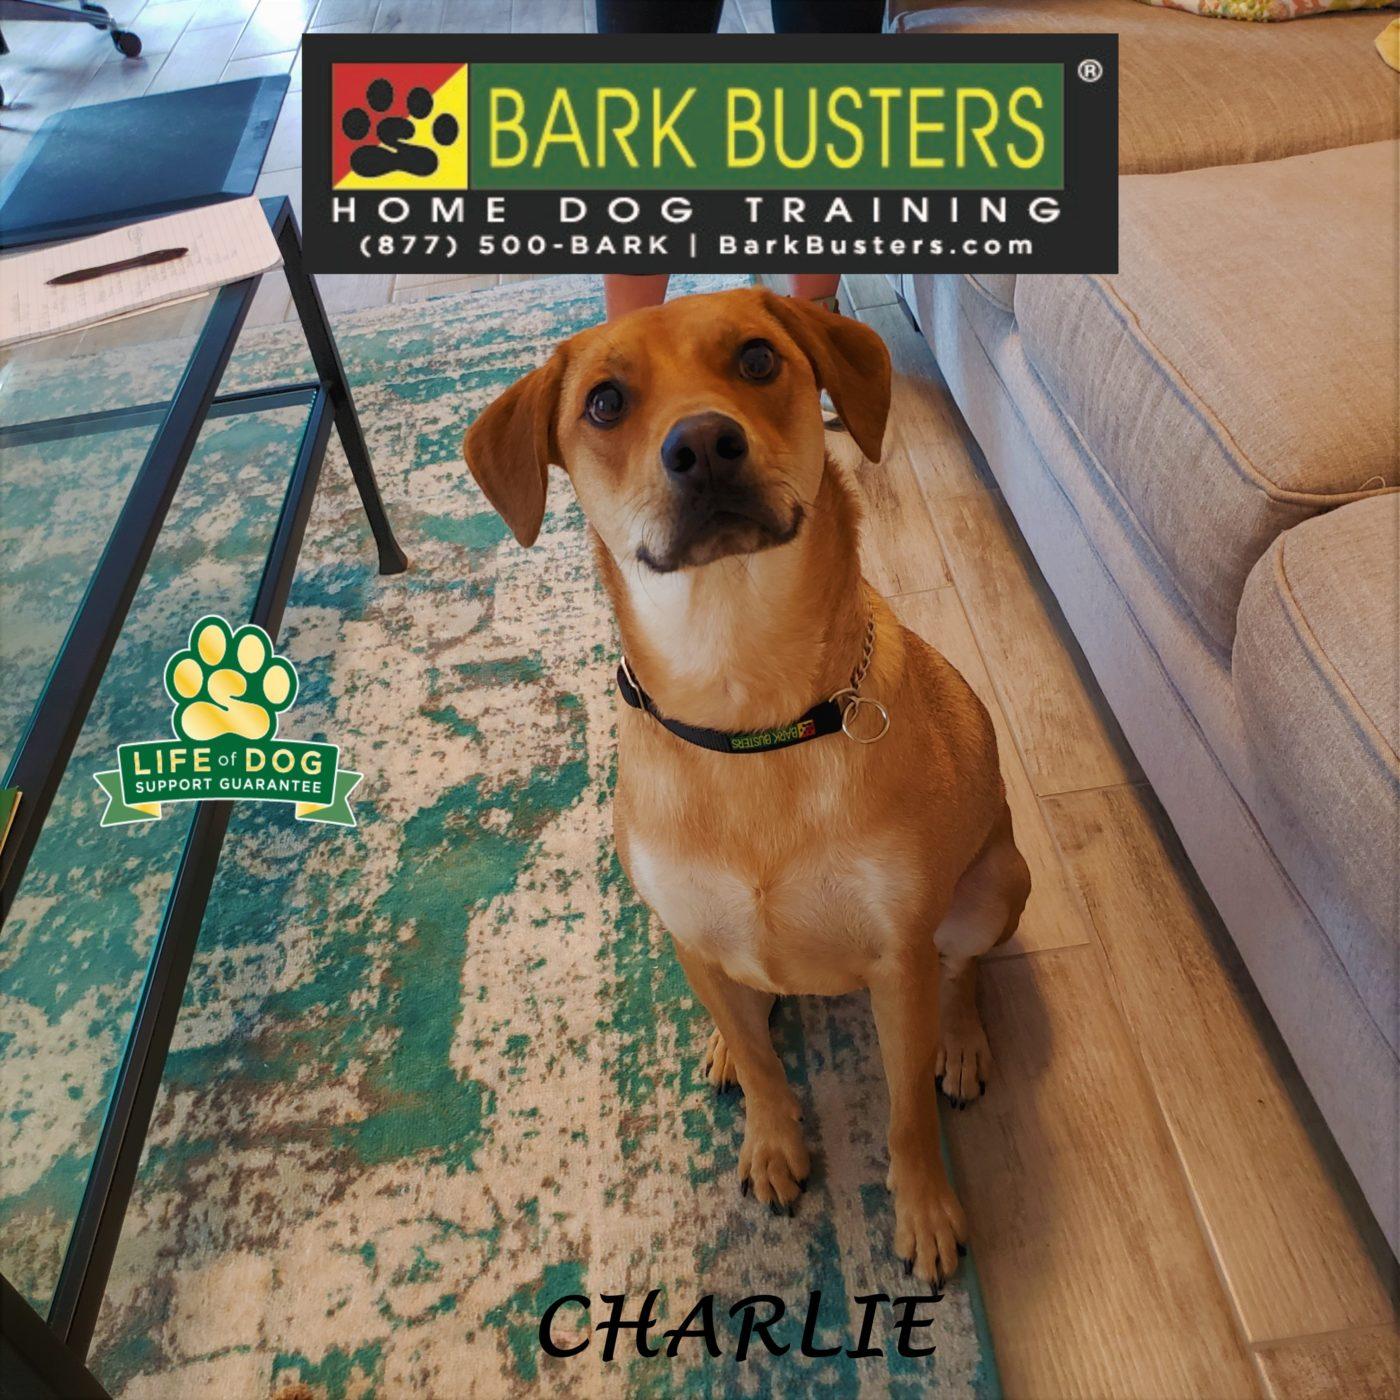 #loveabledog #dogtraininggeorgetown #beaglemix #separationanxiety #leashmanners #dogtrainernearme #barkbusters #speakdog #inhomedogtraining